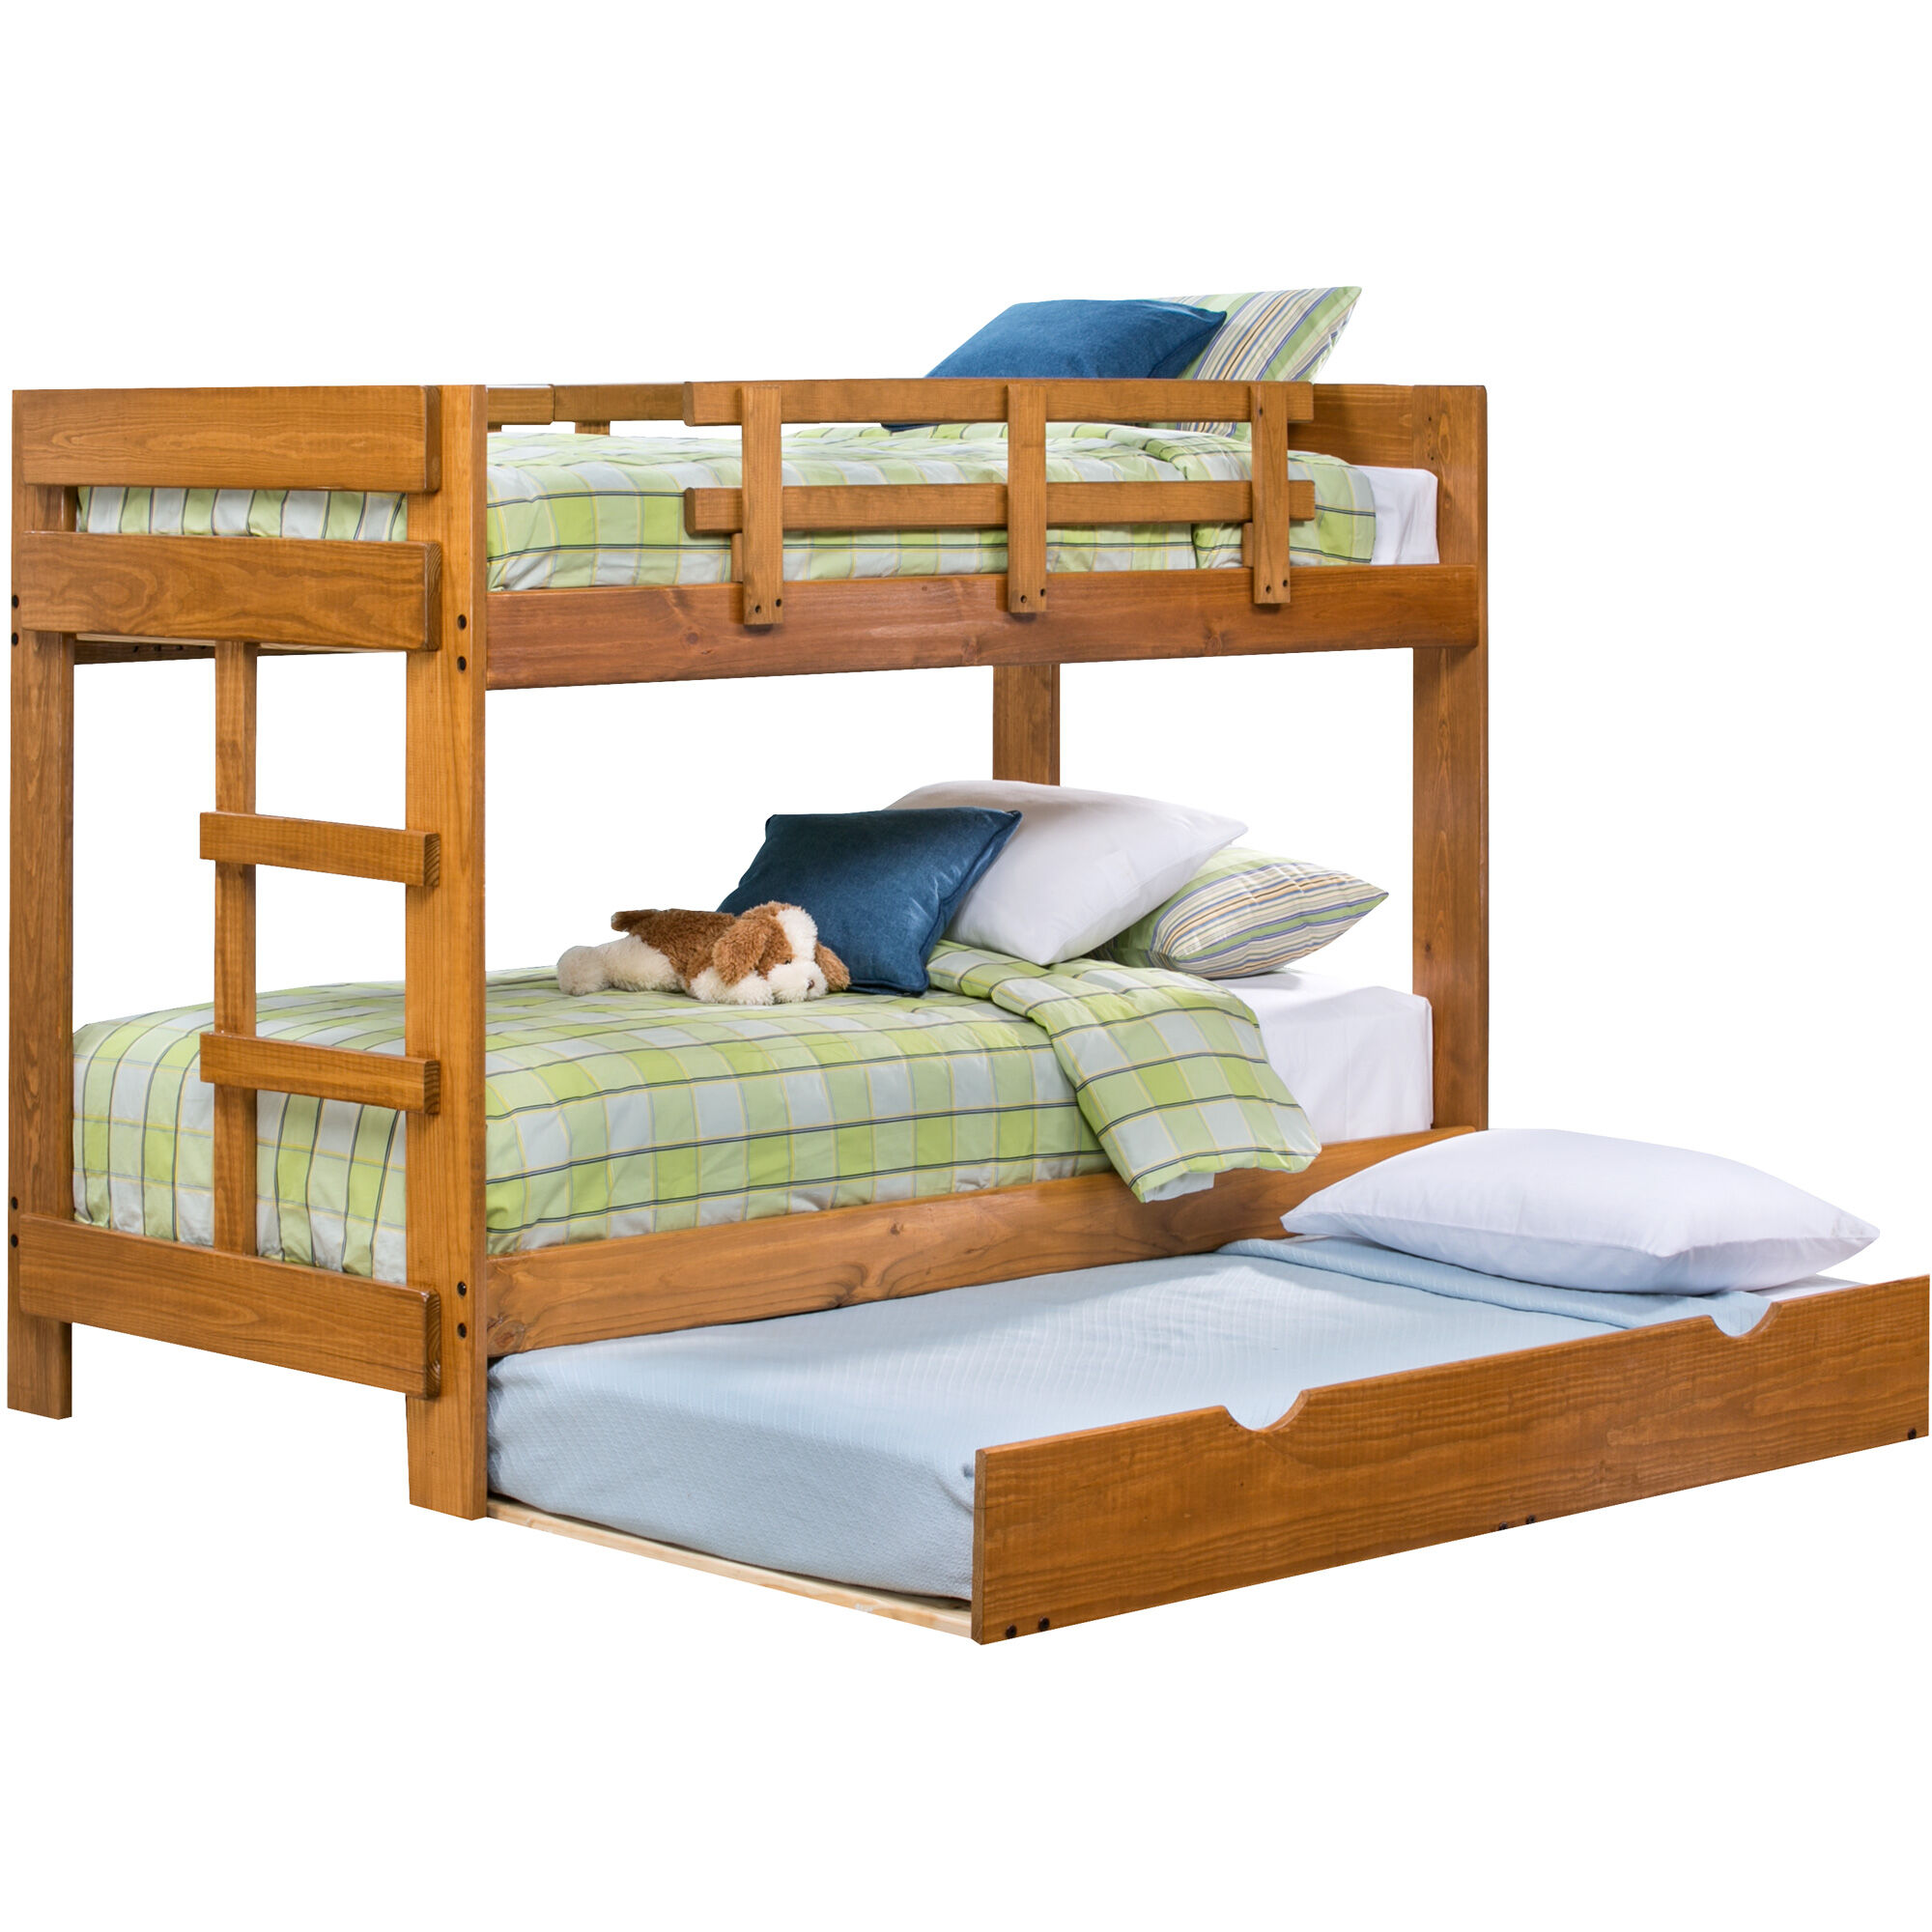 slumberland furniture tanglewood honey tw tw bunk bed Slumberland Bunk Beds id=93808